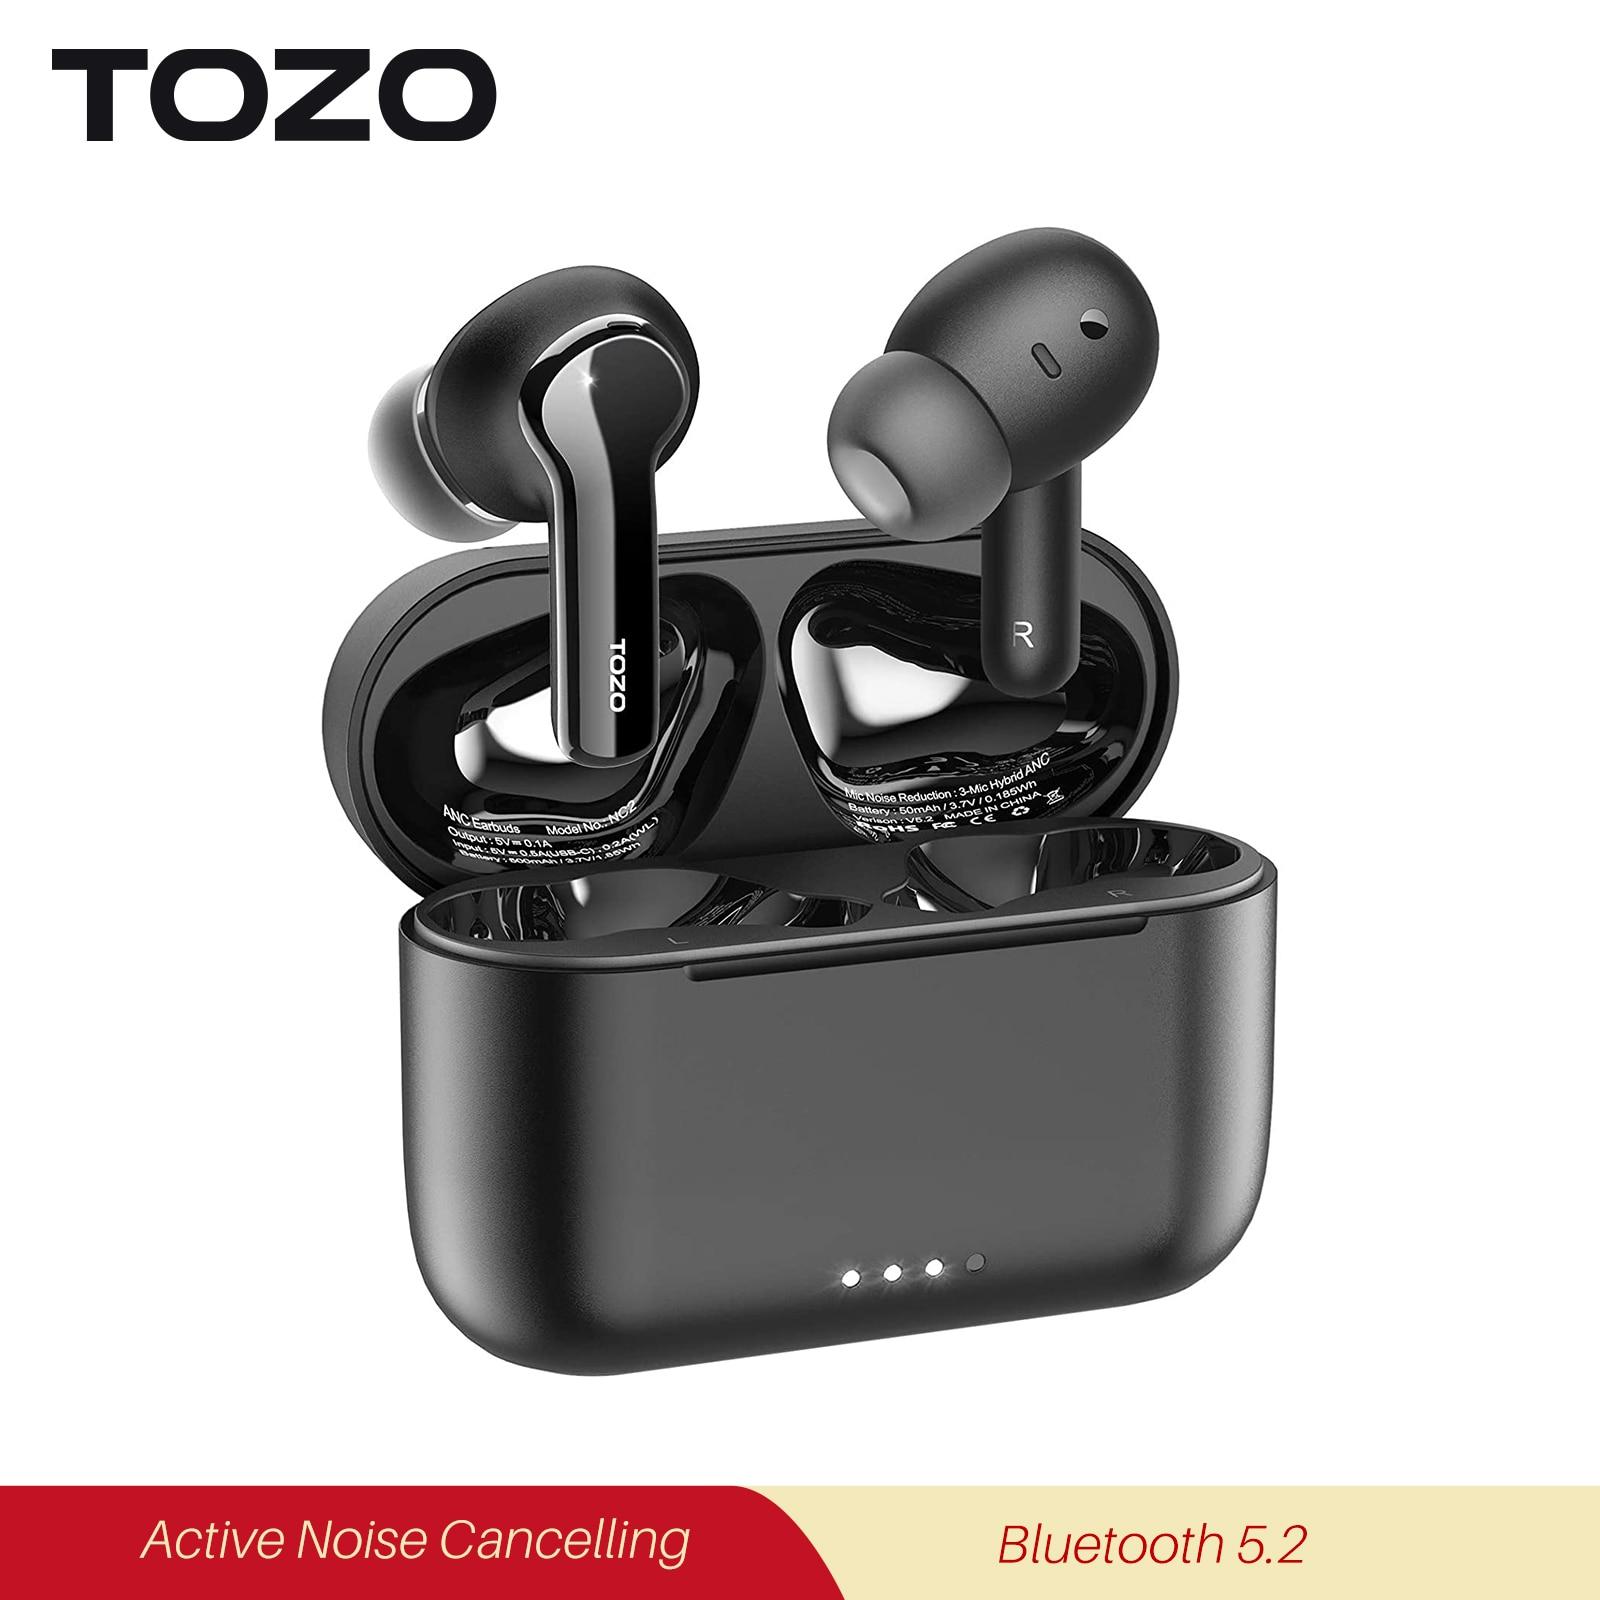 TOZO NC2 Earphone Bluetooth 5.2 Wireless Earbuds ANC Headphones IPX6 Stereo Bass Tws Headset Noise Cancelling Earpiece